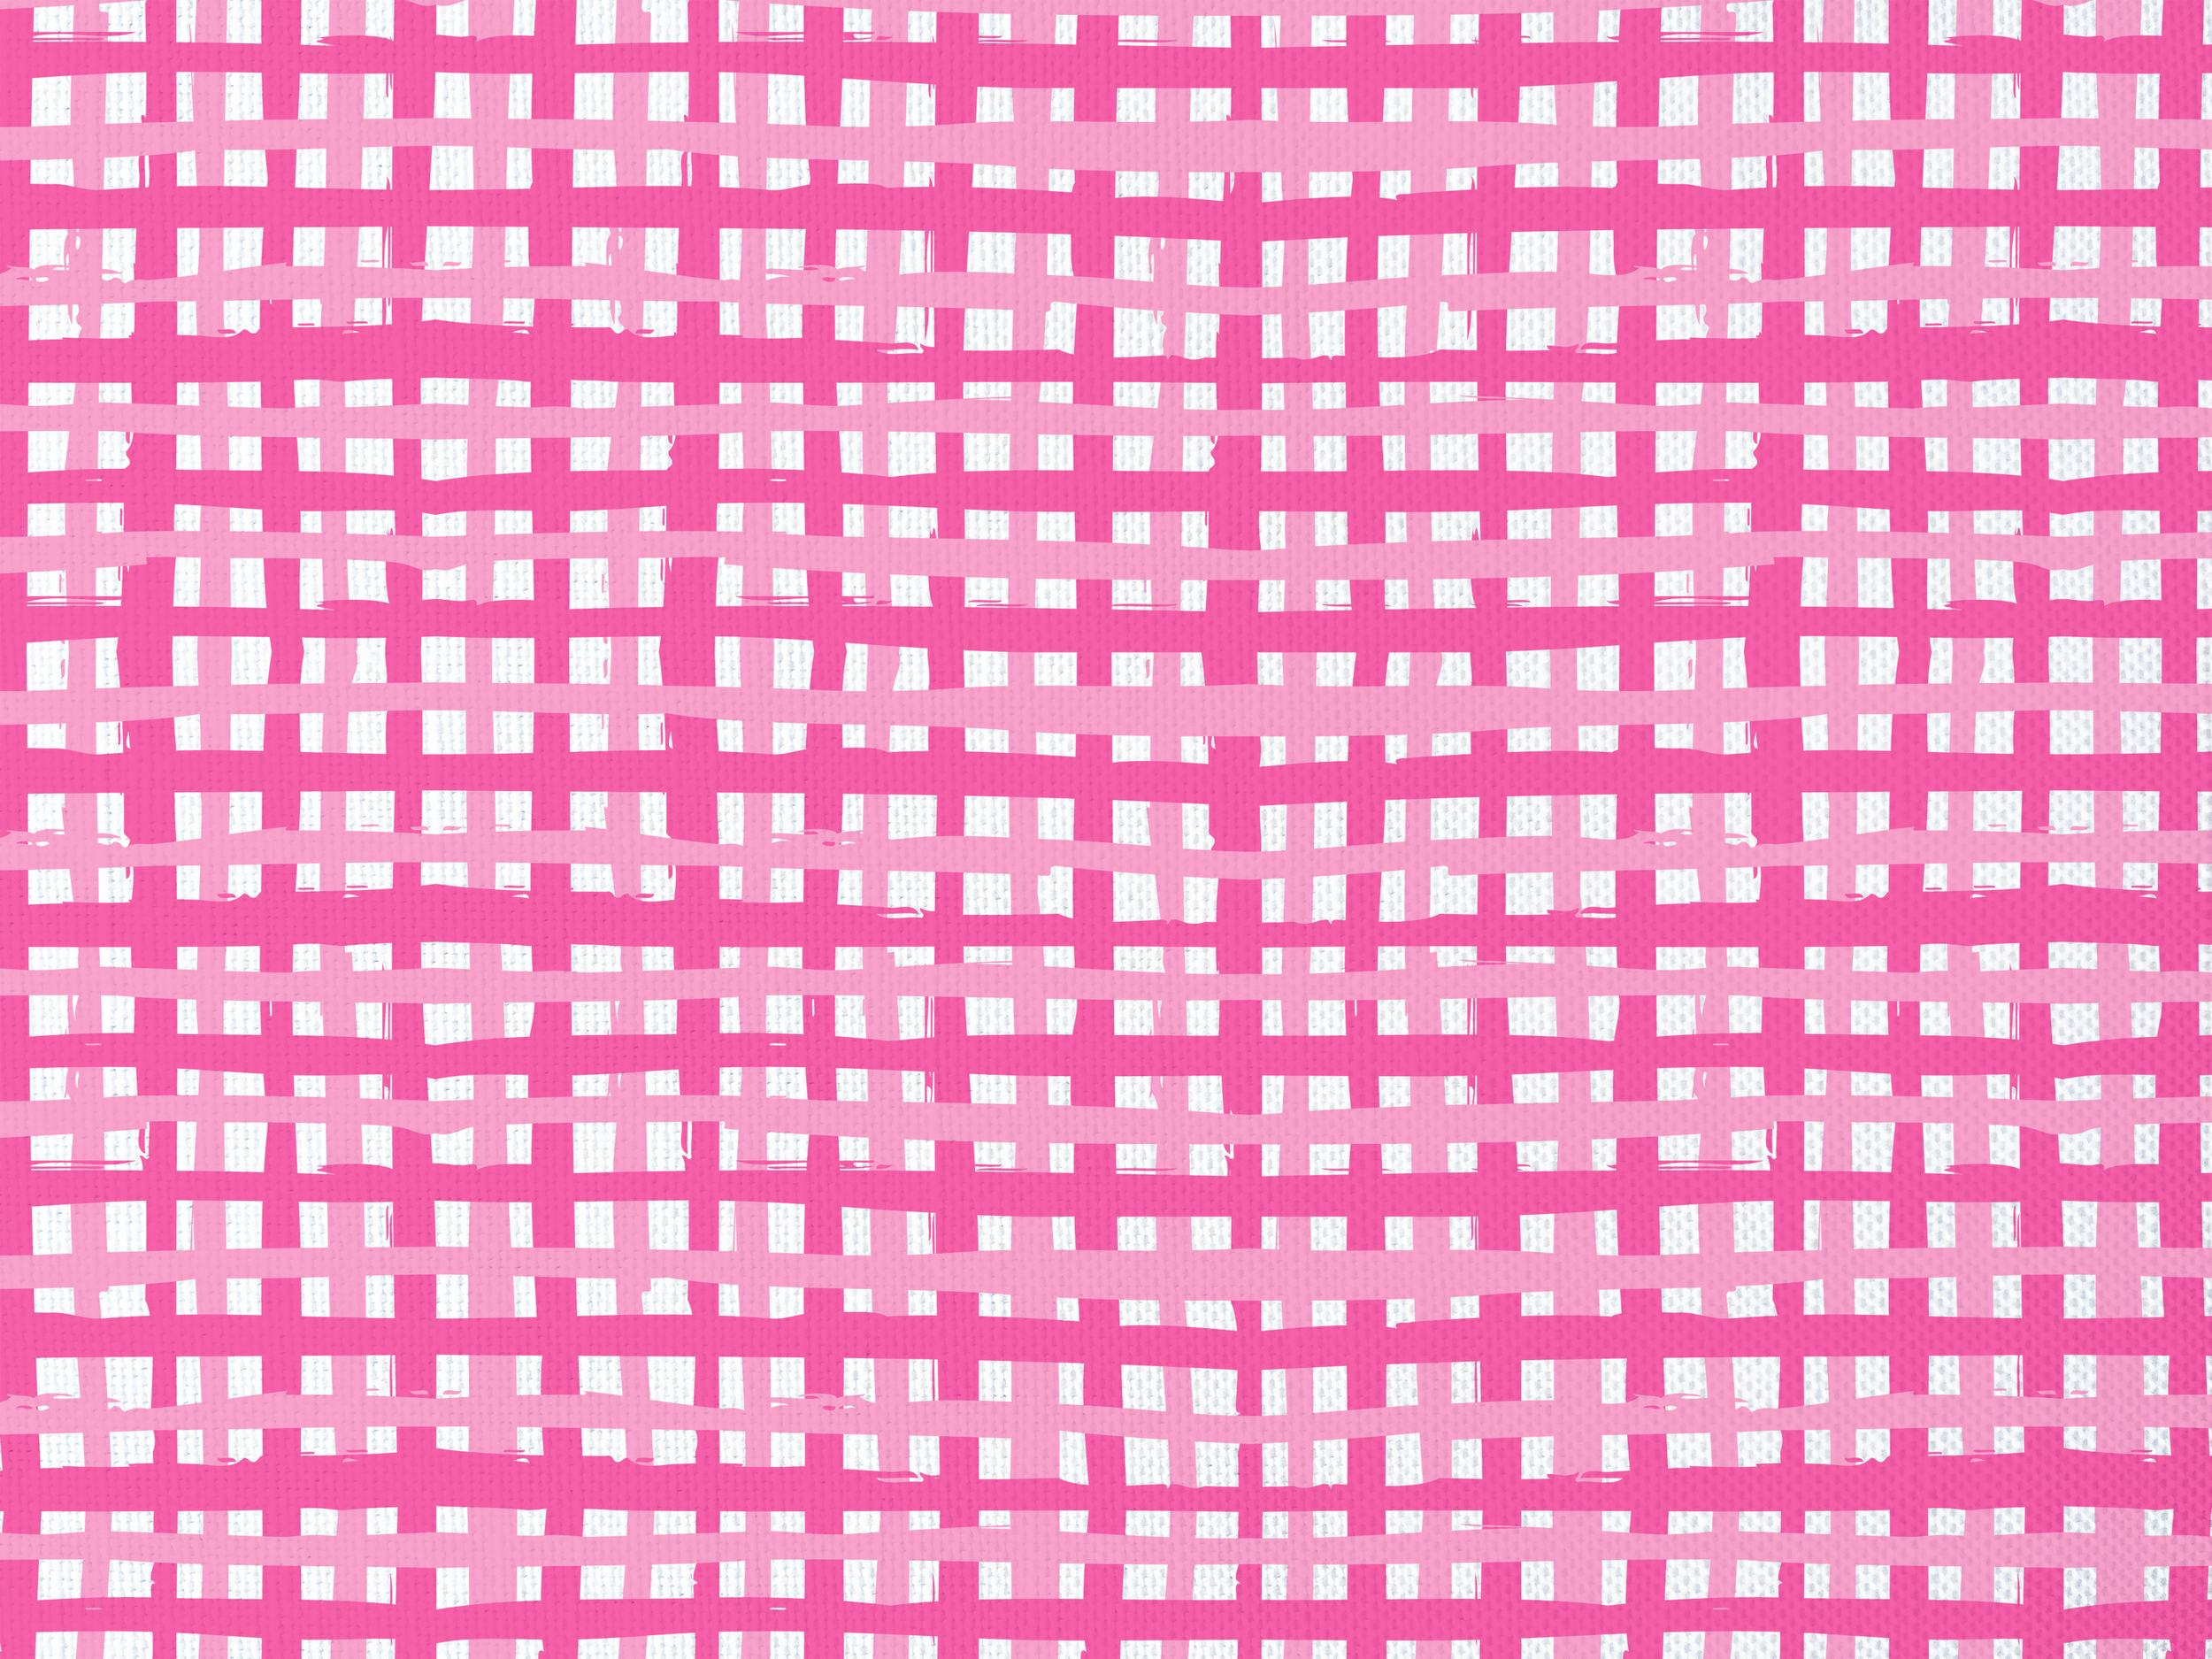 ArborStripeCheck-Pink.jpg